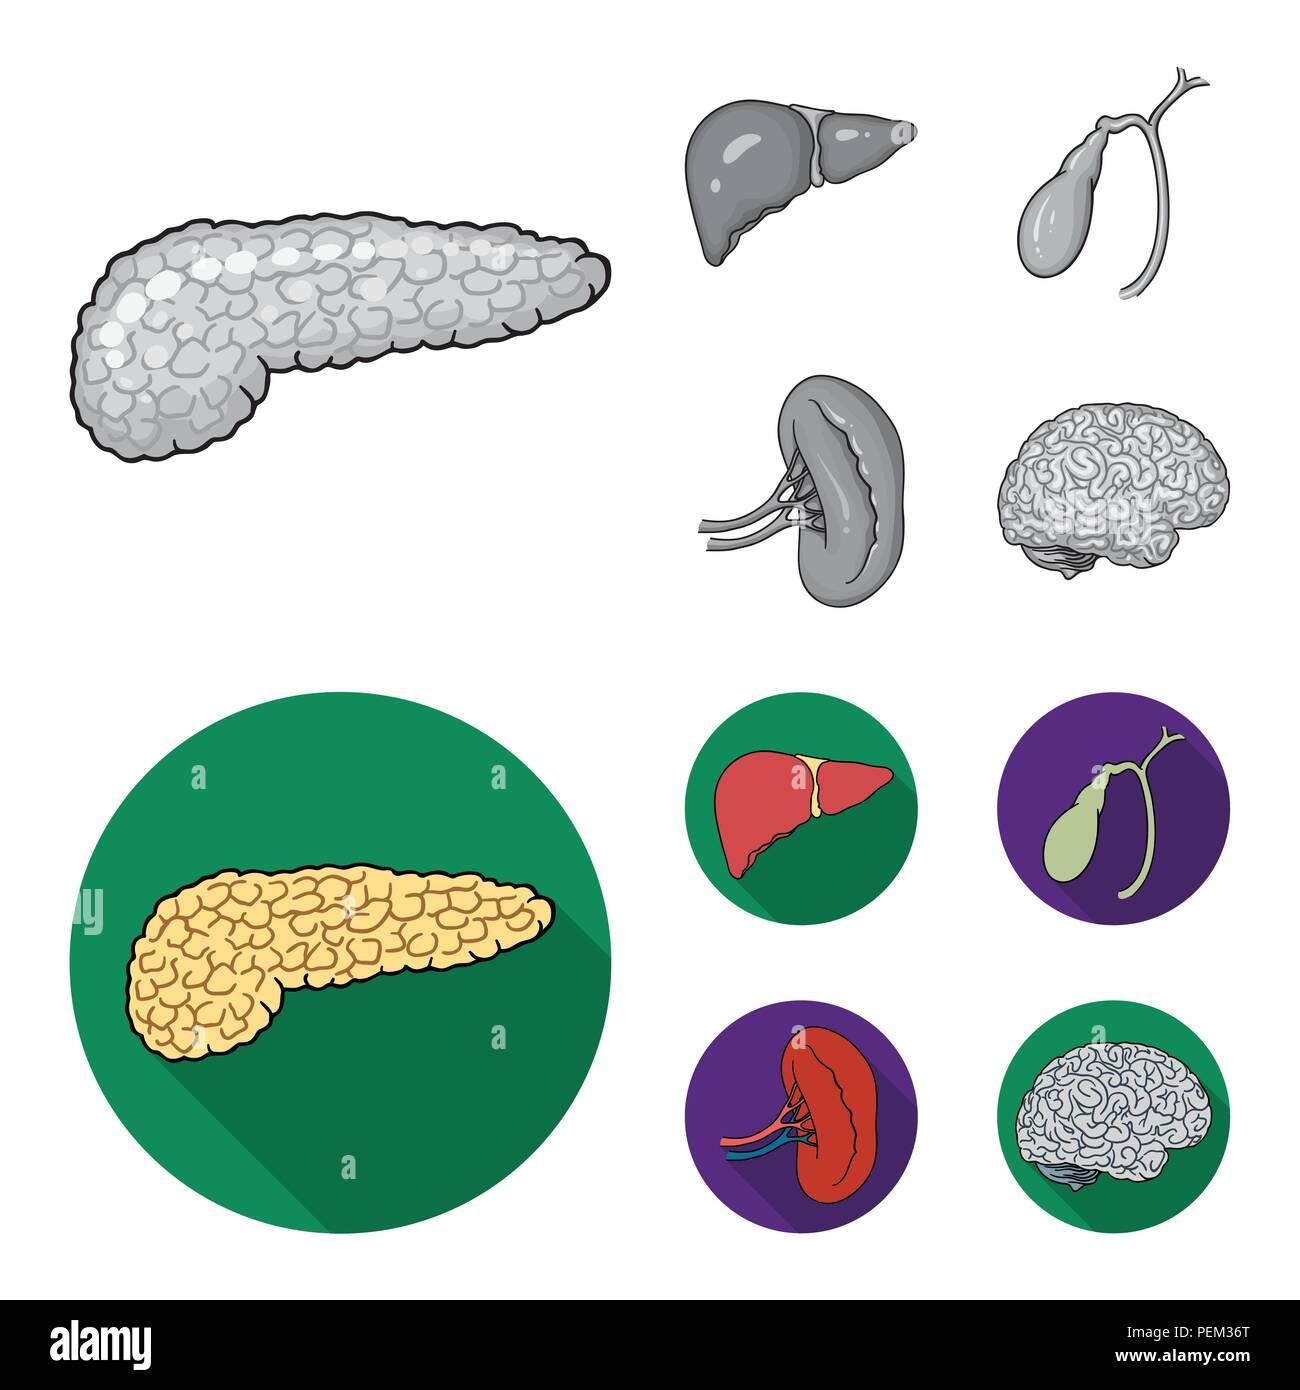 Gallbladder Kidney Stockfotos & Gallbladder Kidney Bilder - Alamy